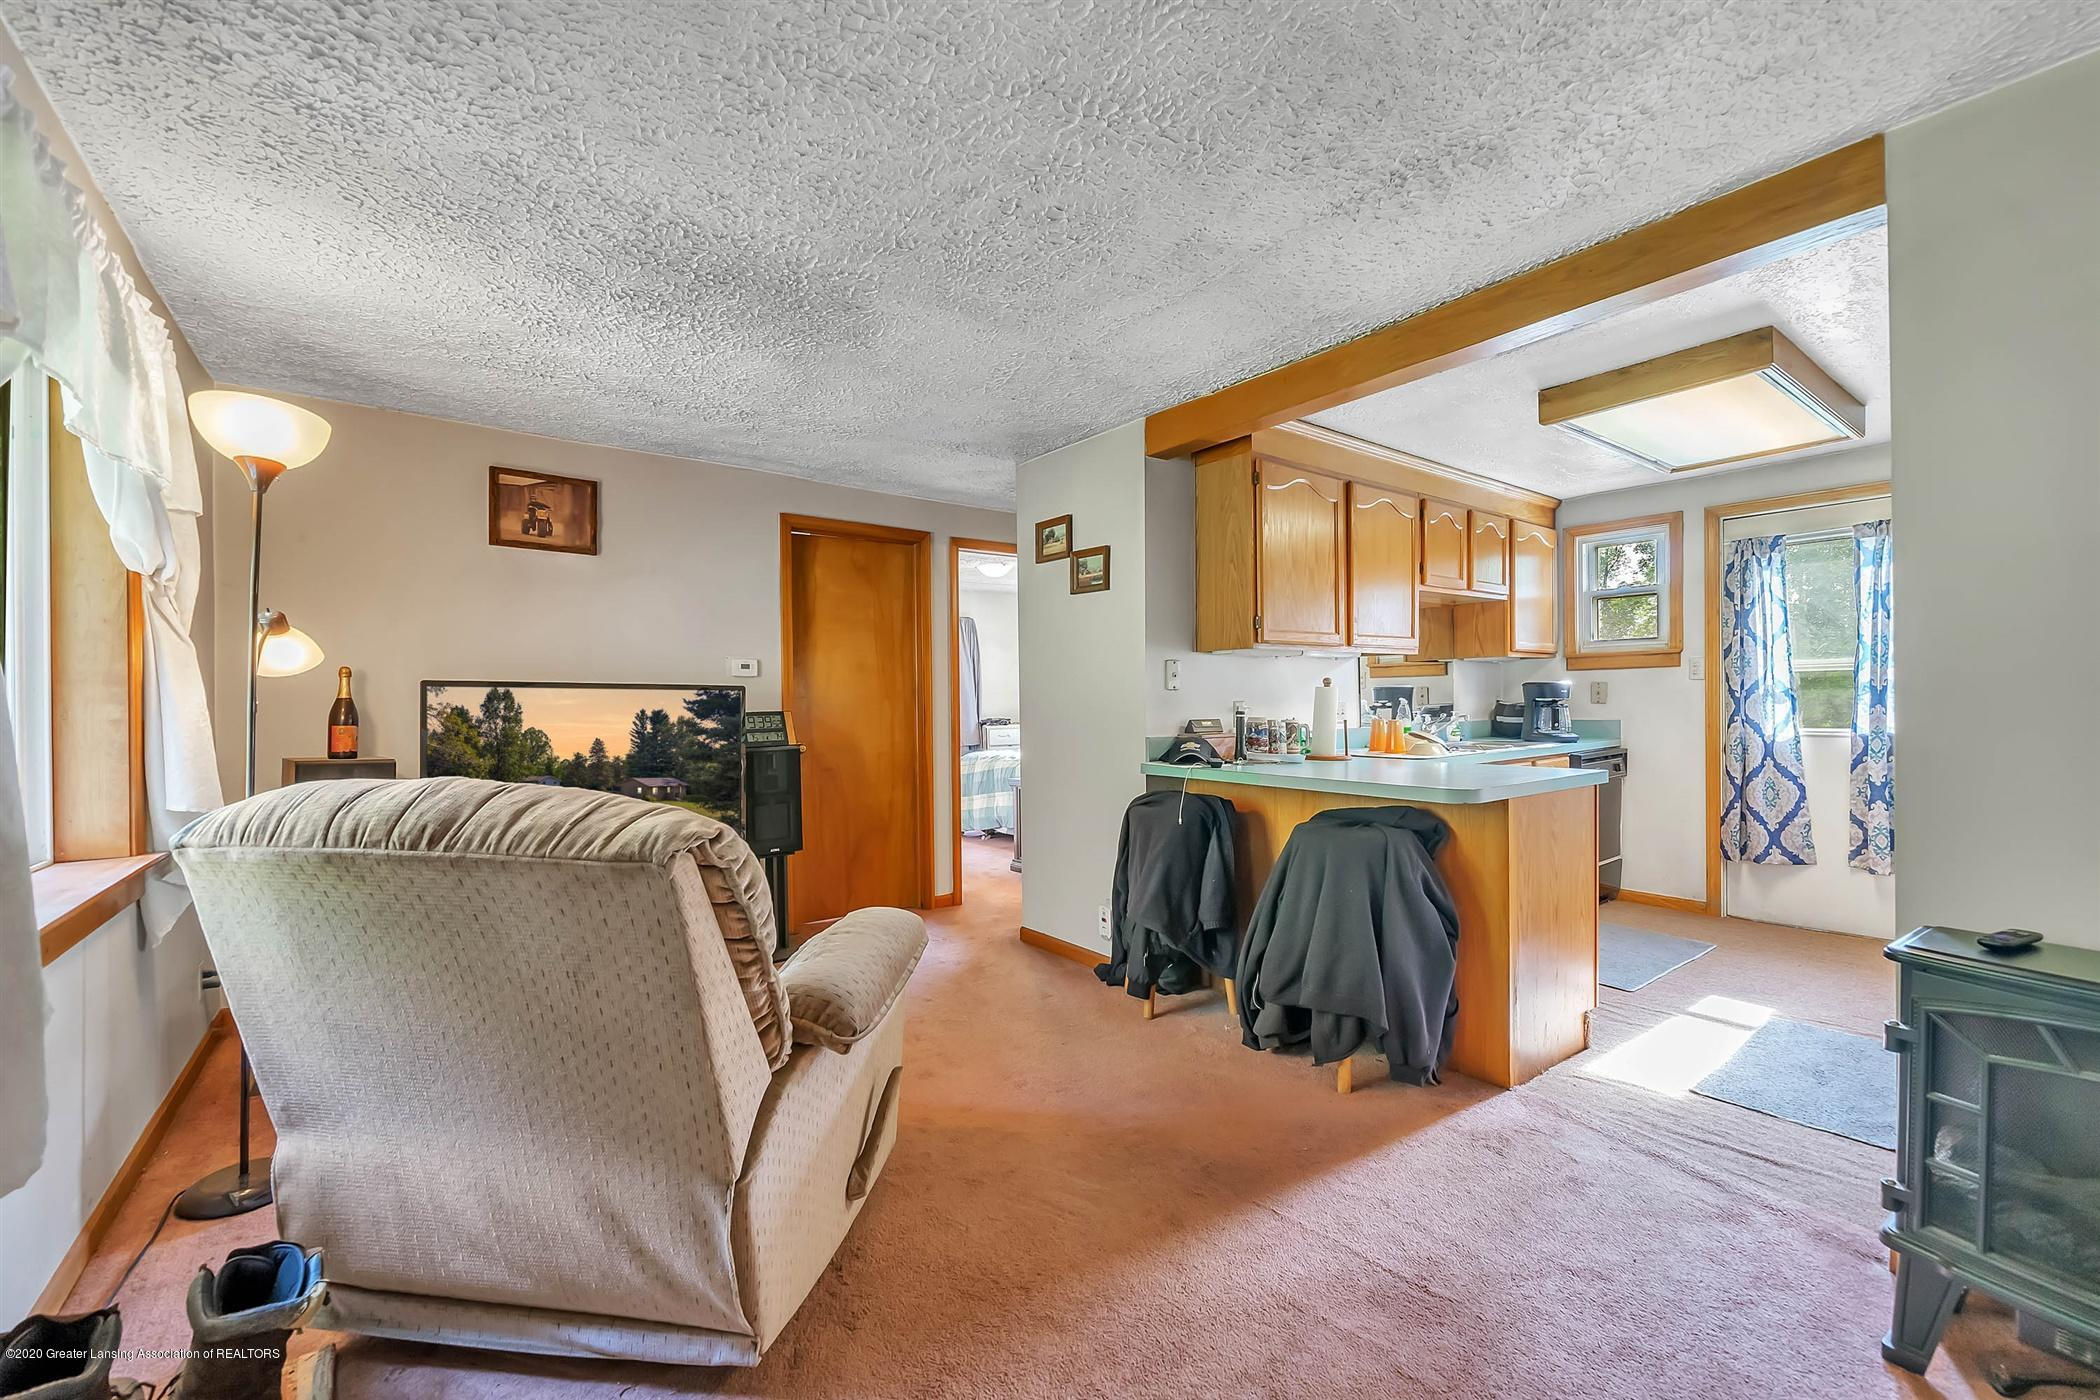 6750 W Lovejoy Rd - (34) 6758 Lovejoy Living Room - 34